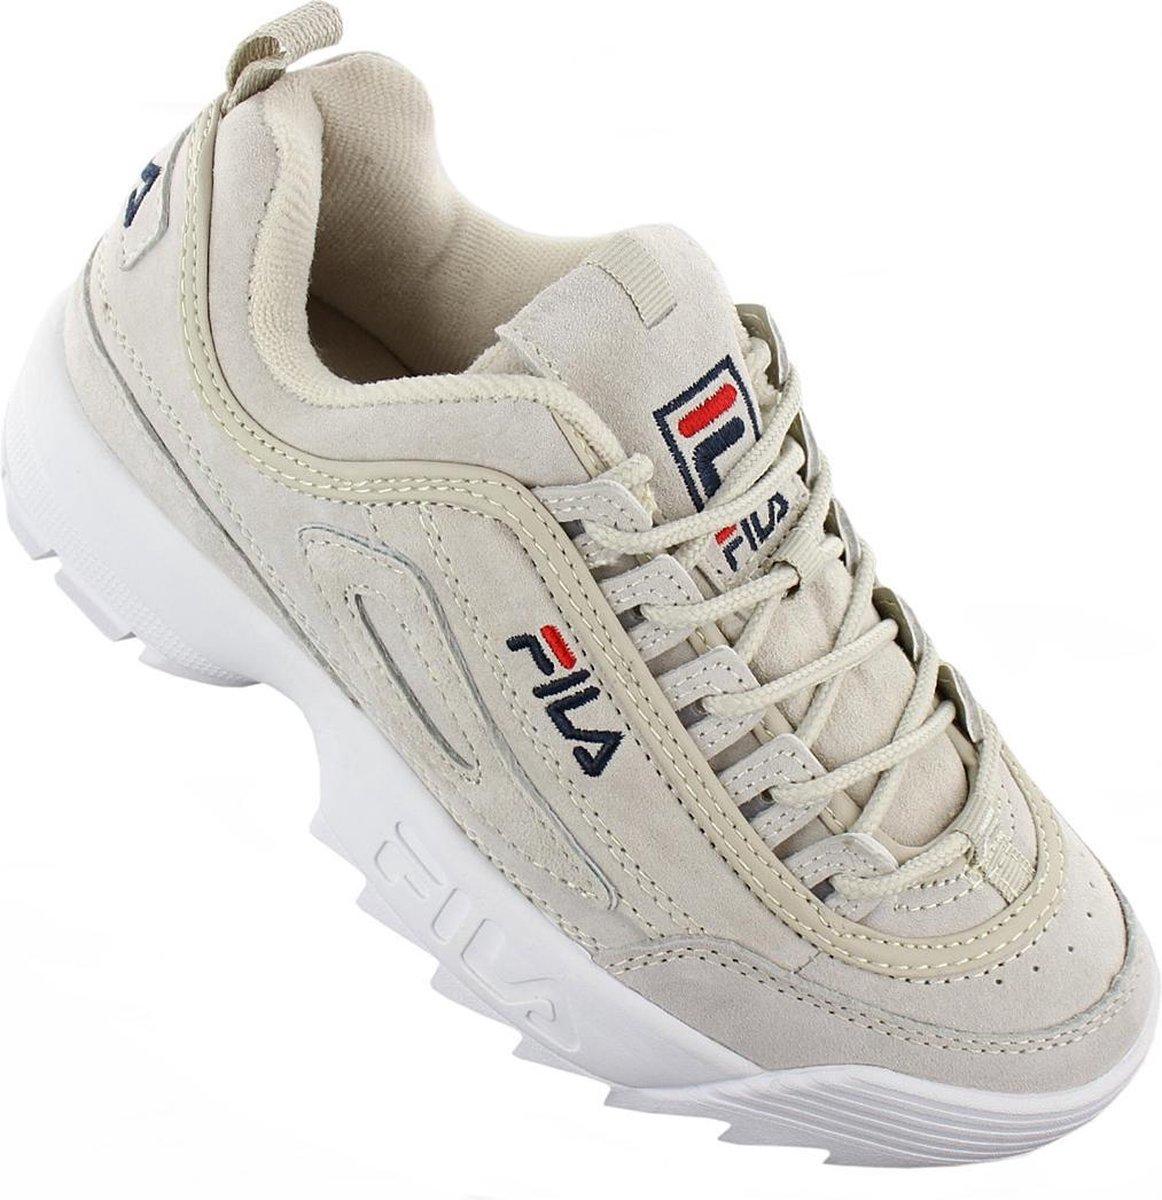 Fila Disruptor S Sneakers Dames Chateau Grey